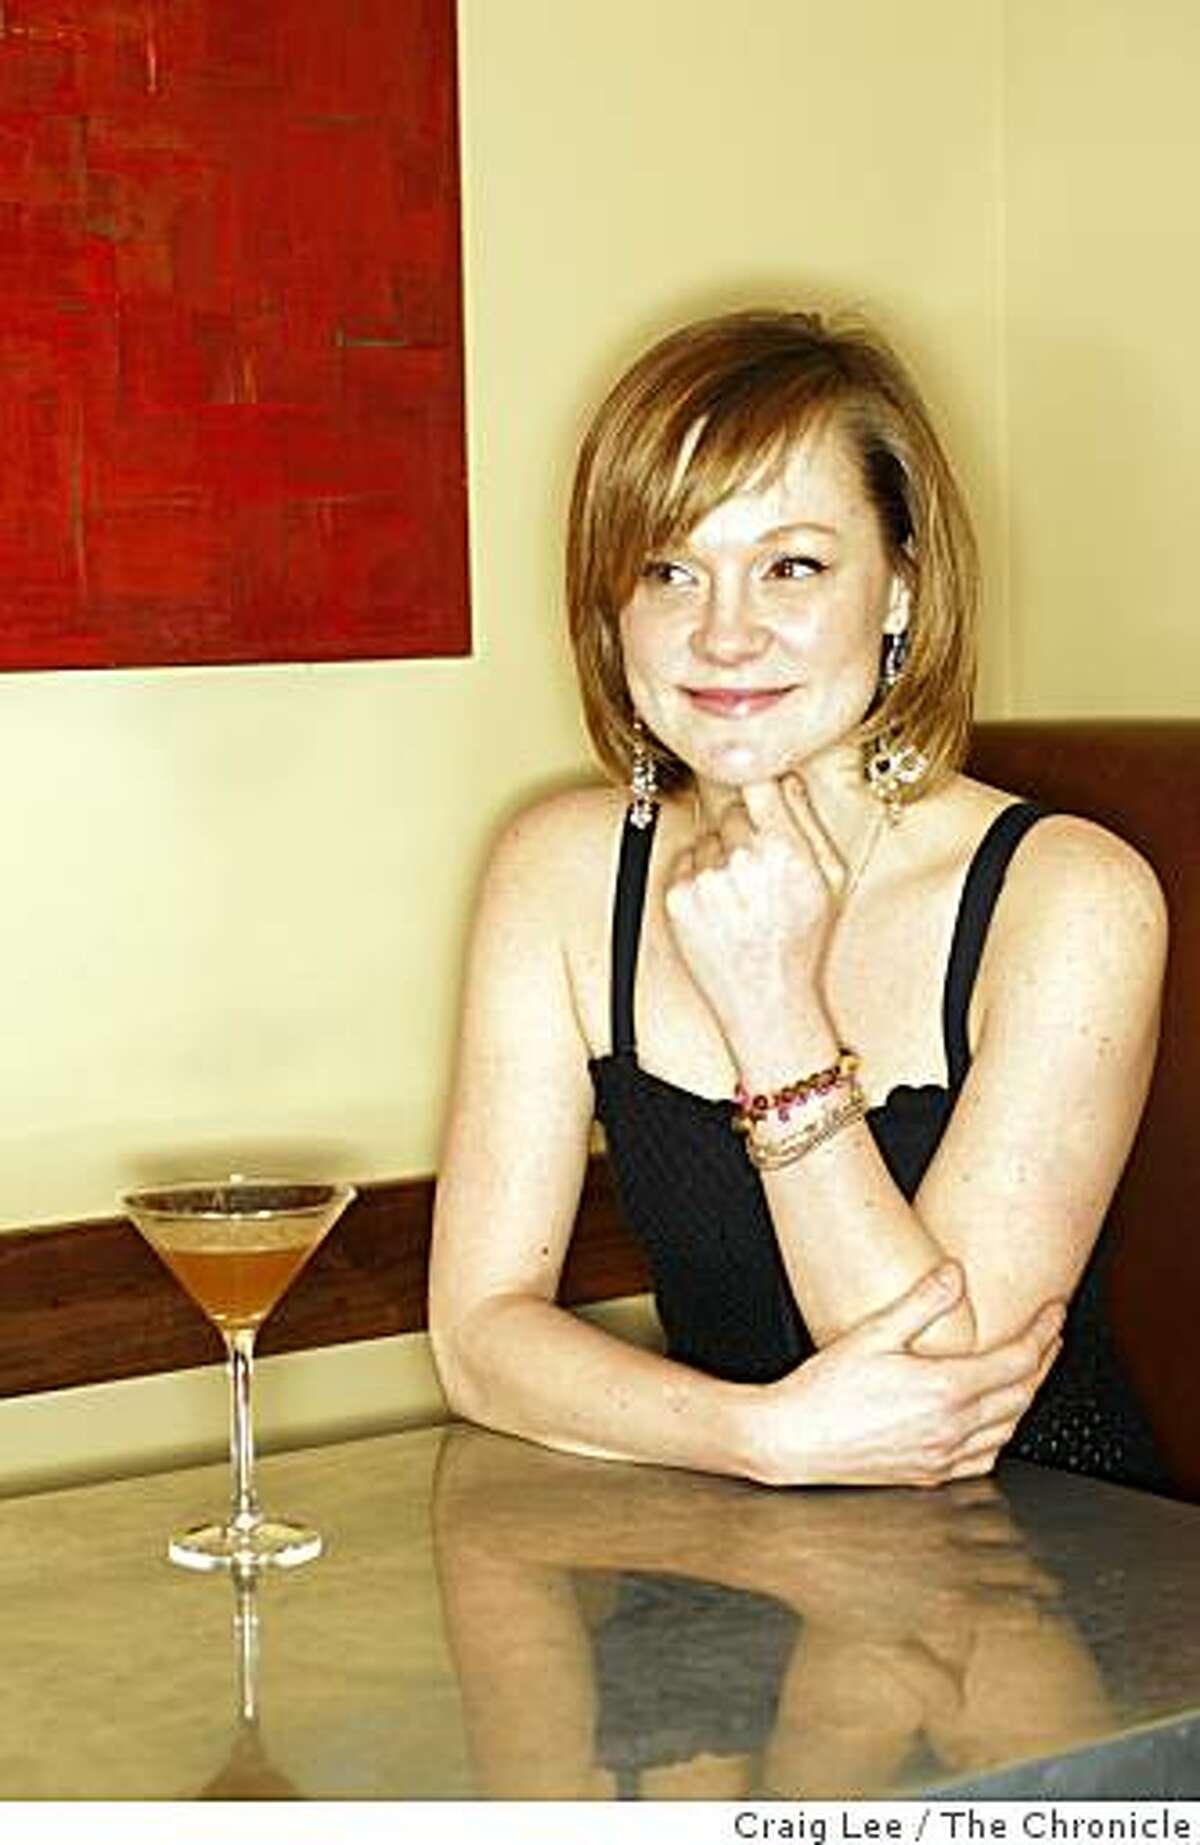 Brooke Arthur, bar manager at Range restaurant with her drink the Kokomo in San Francisco, Calif., on February 13, 2009.